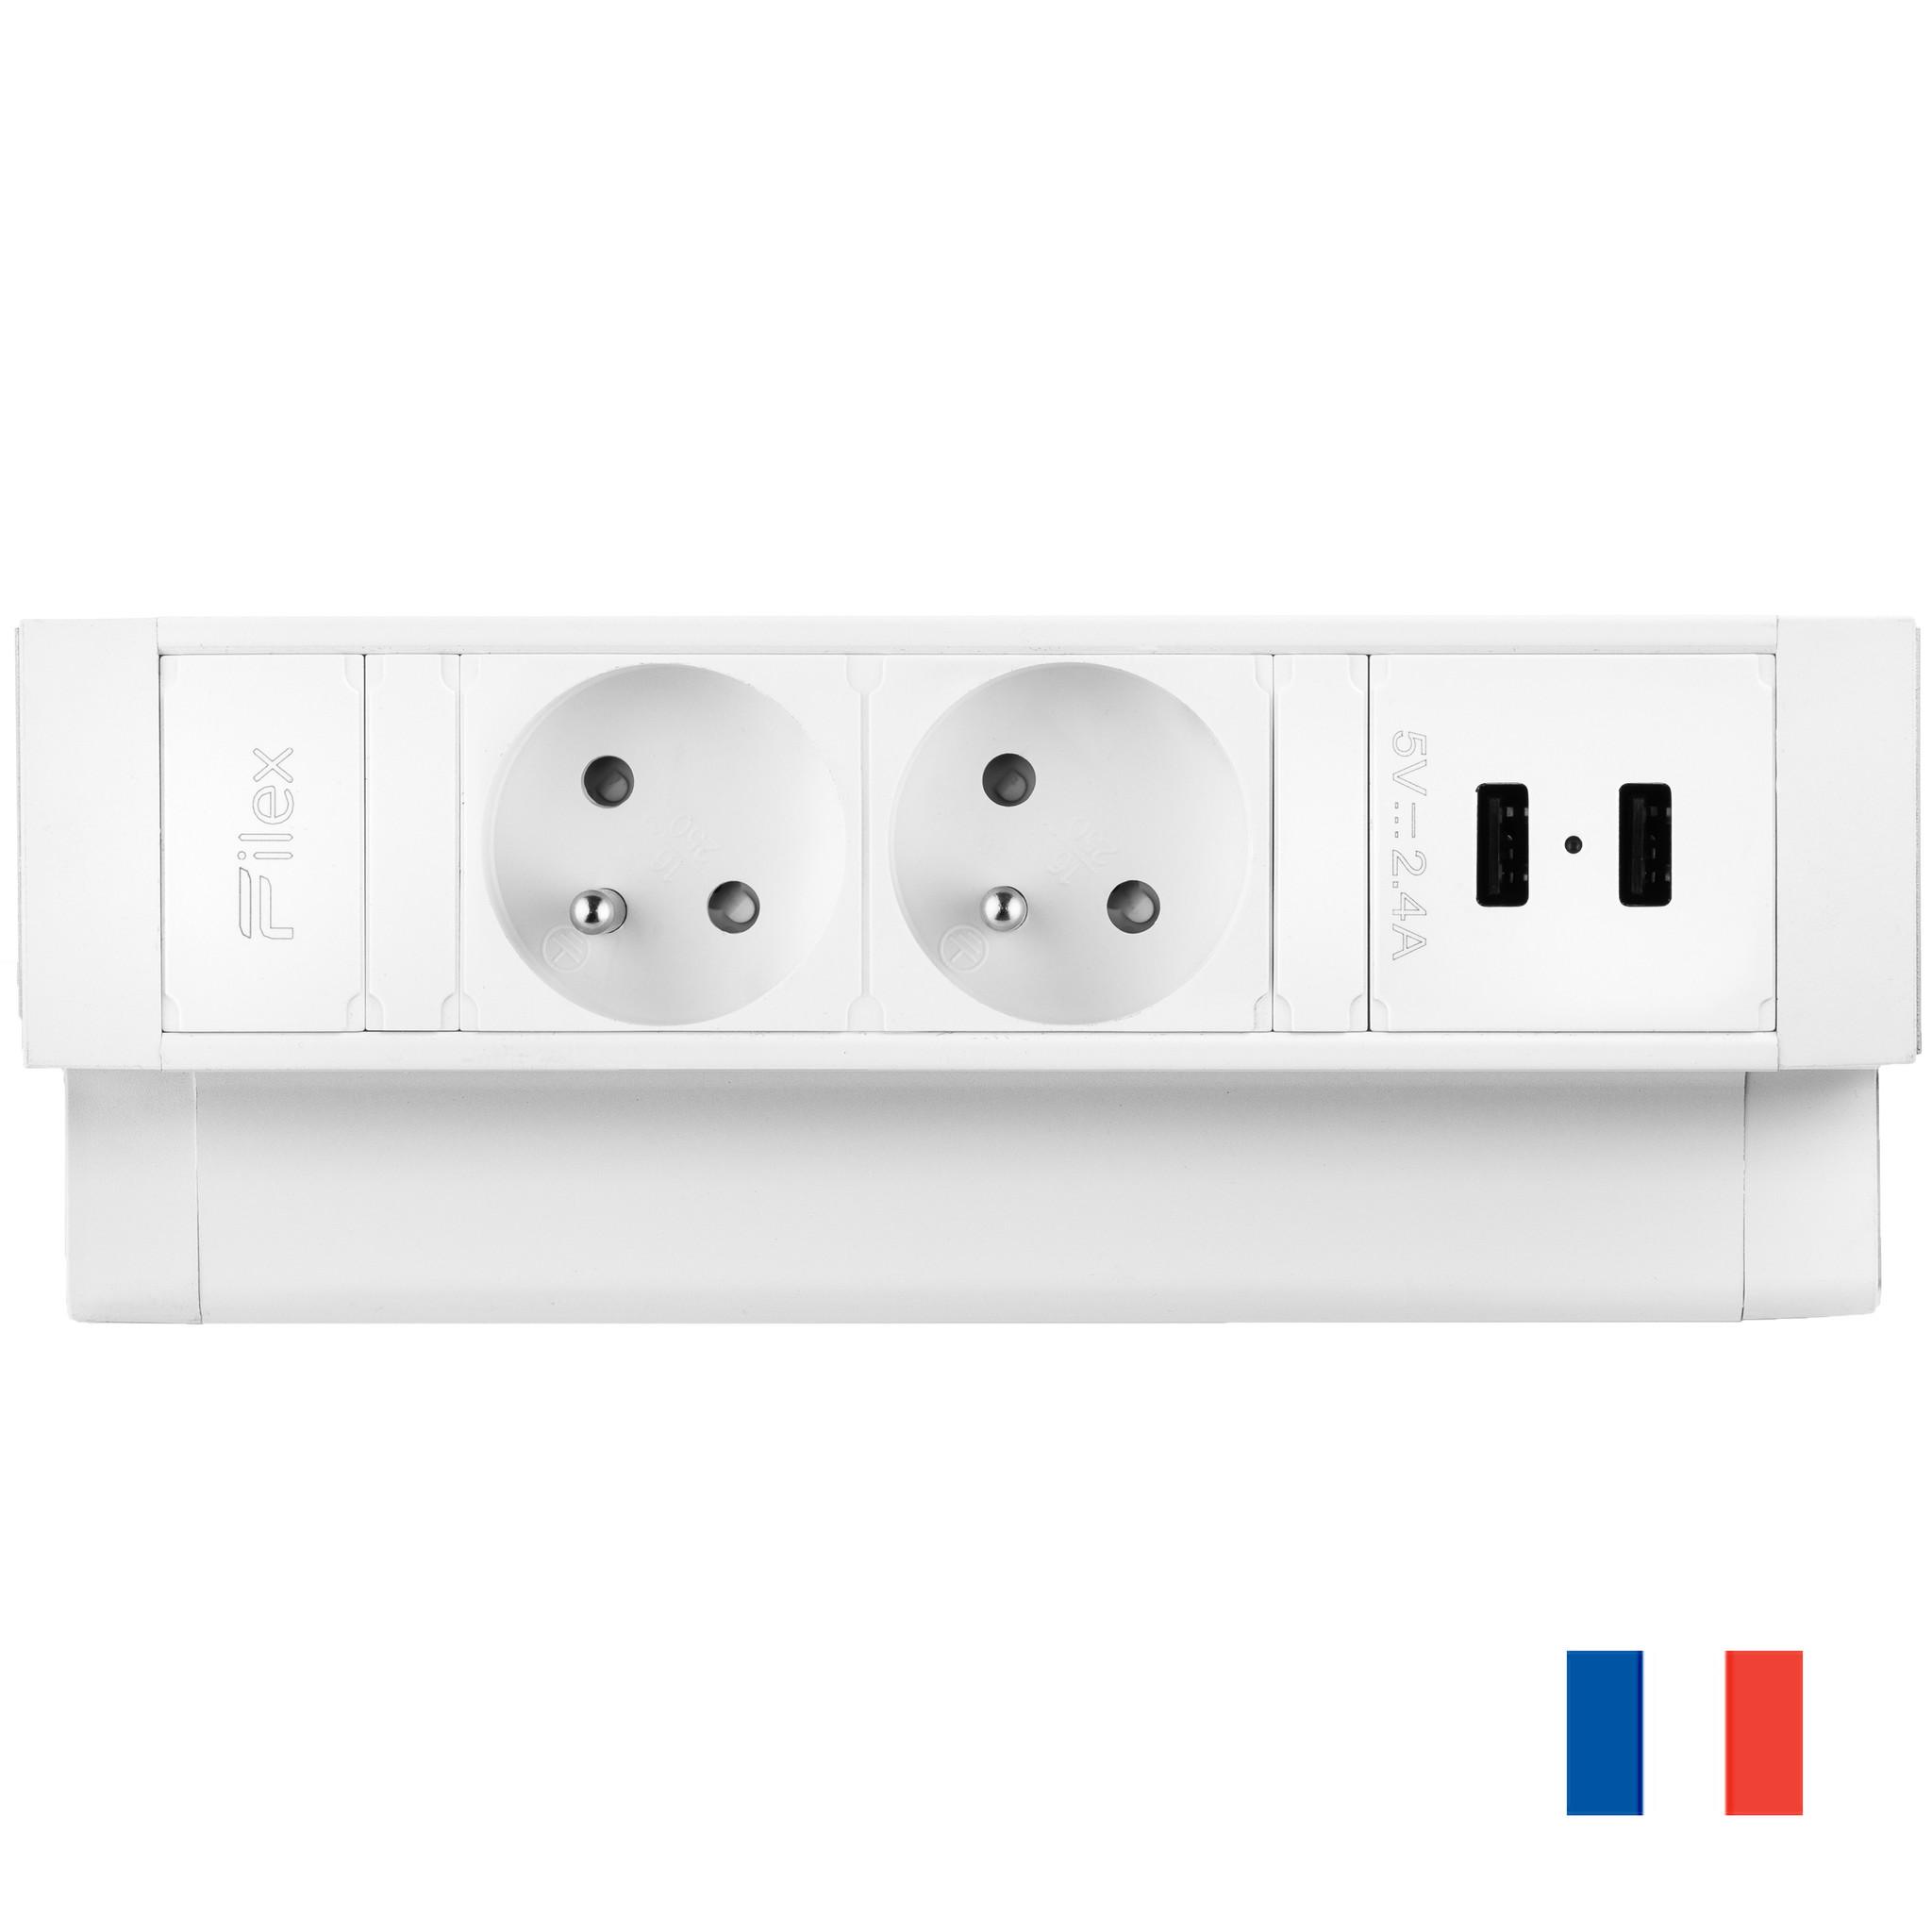 Ergopro Desk Up 2.0 - 2x penaarde power & 2x USB charger wit